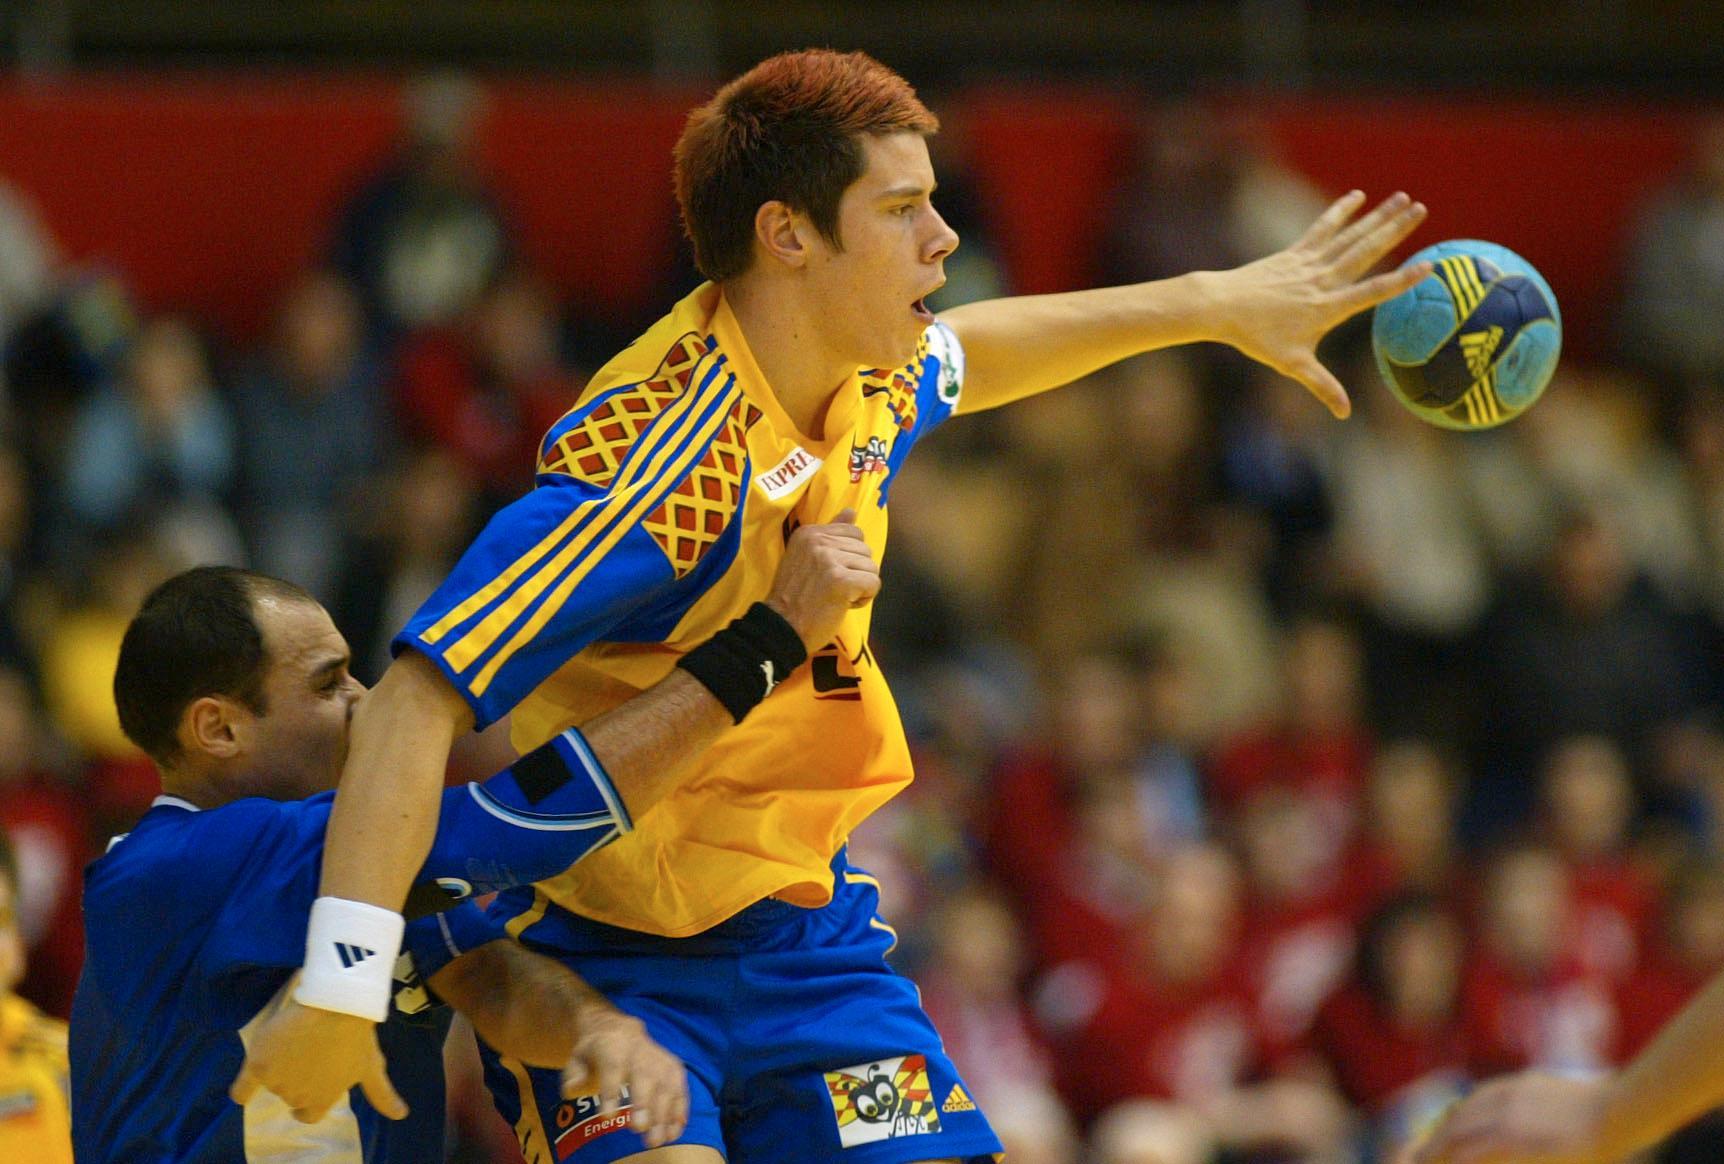 Kim Andersson mot Serbien/Montenegro, EM 2004.